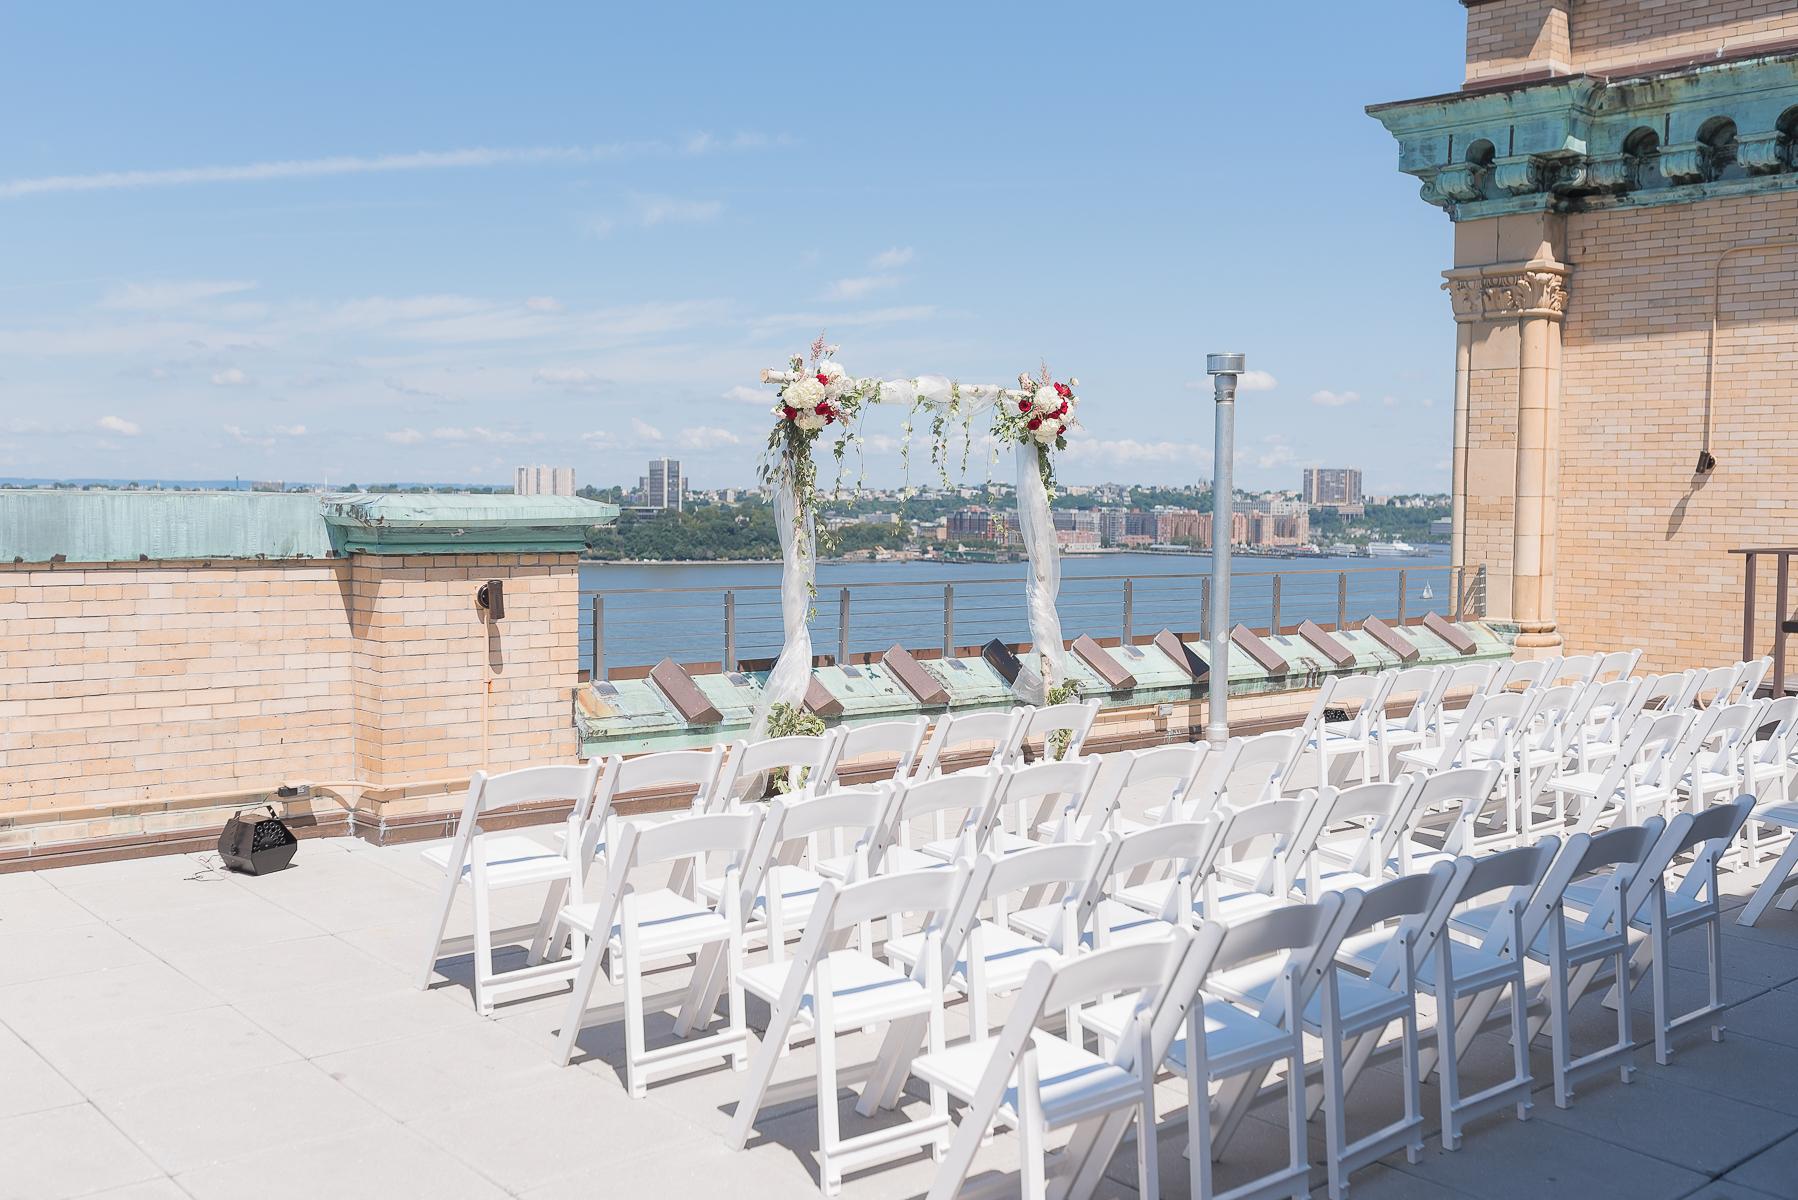 NYC-Ramscale-Wedding-Ceremony-Space.jpg